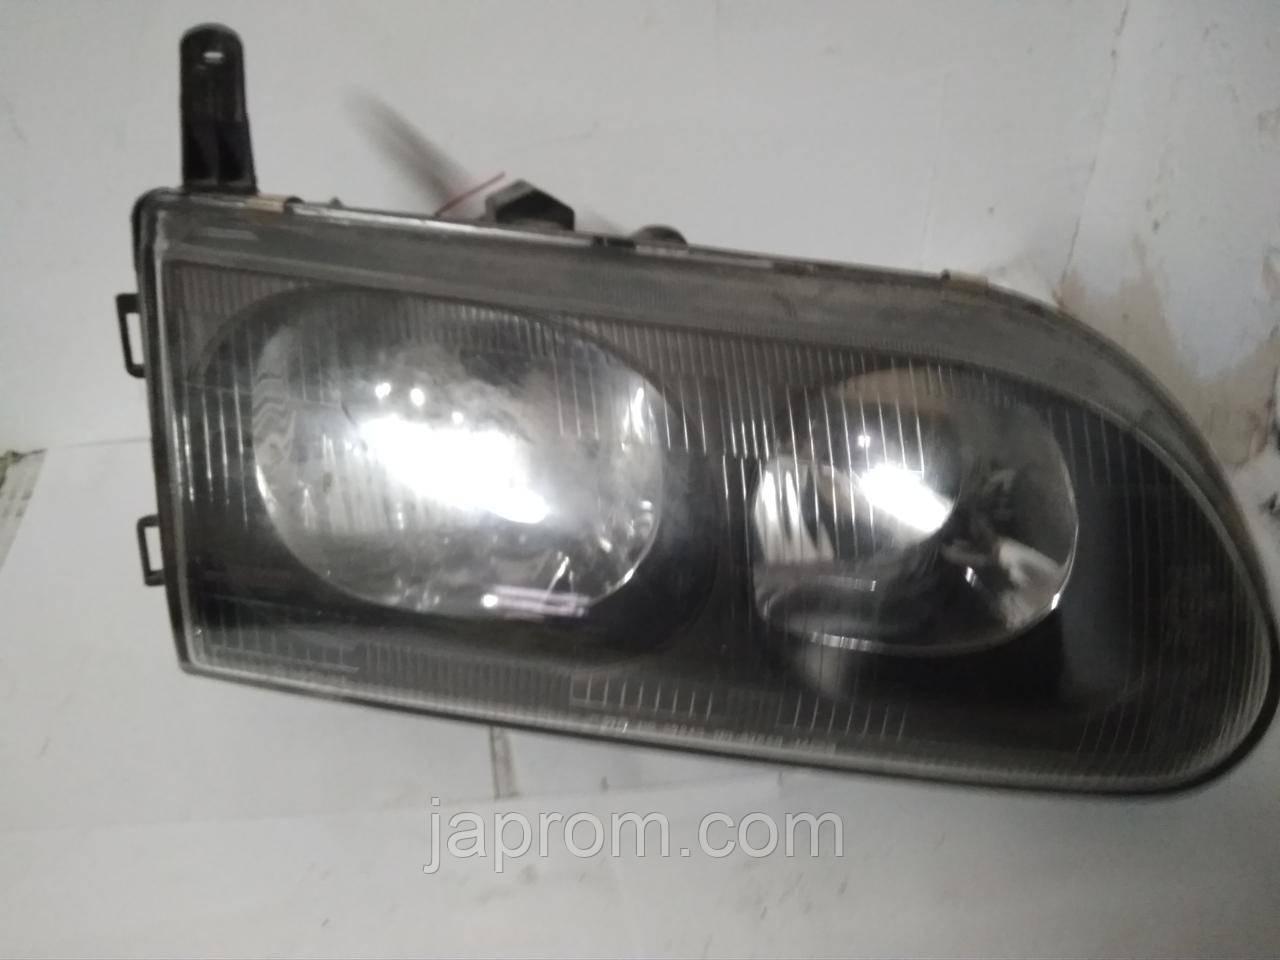 Фара передняя правая Mitsubishi L400 Koito 110-87246 110-87245